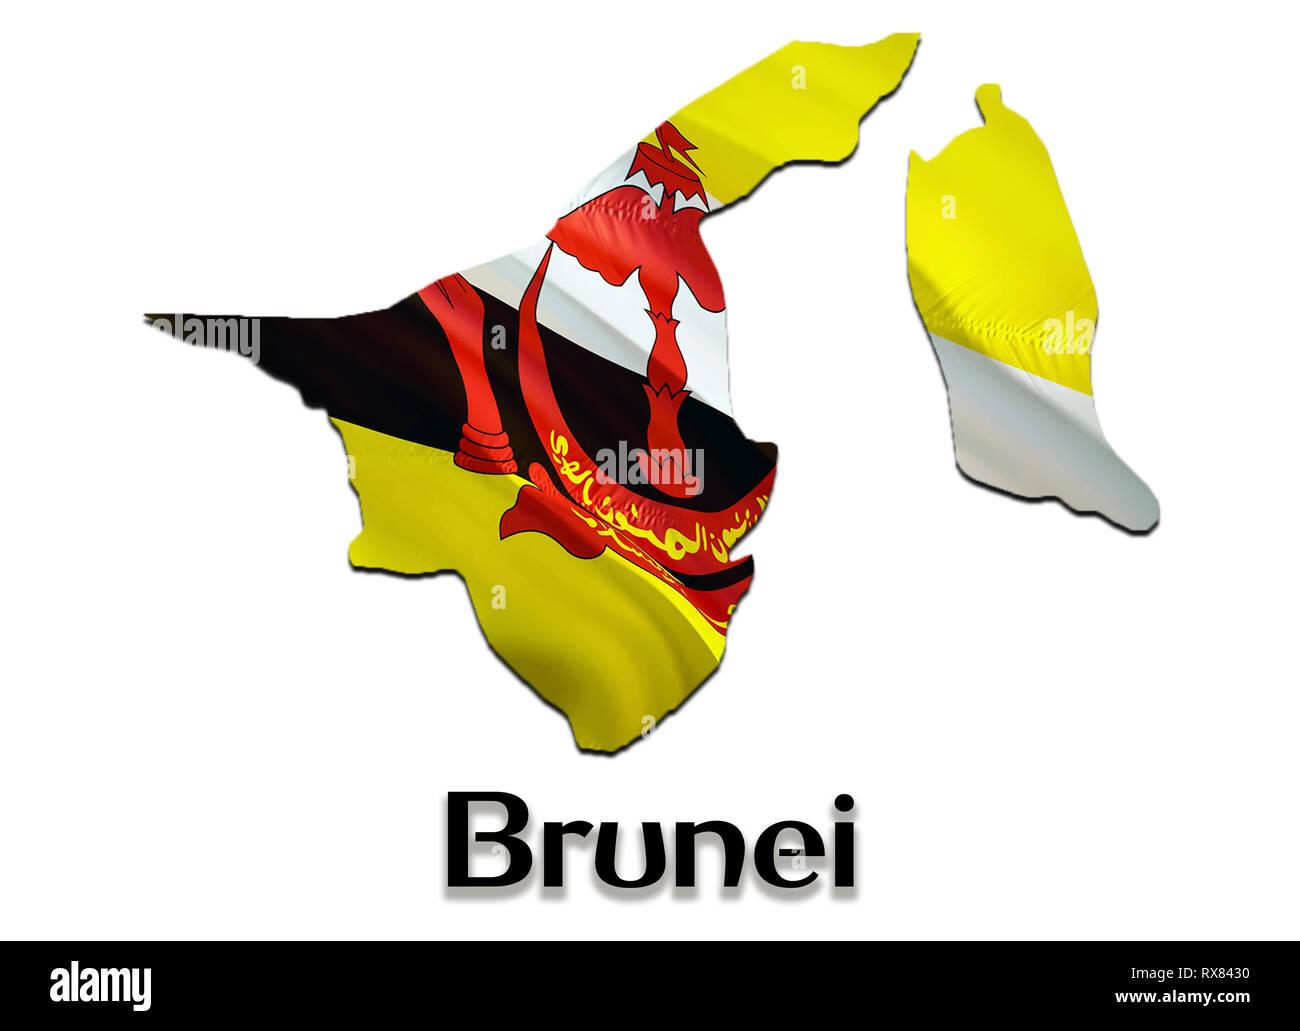 Brunei Map Flag. 3D rendering Brunei map and flag on Asia map. The national symbol of Brunei. Bandar Seri Begawan flag on Asia background. National Br - Stock Image